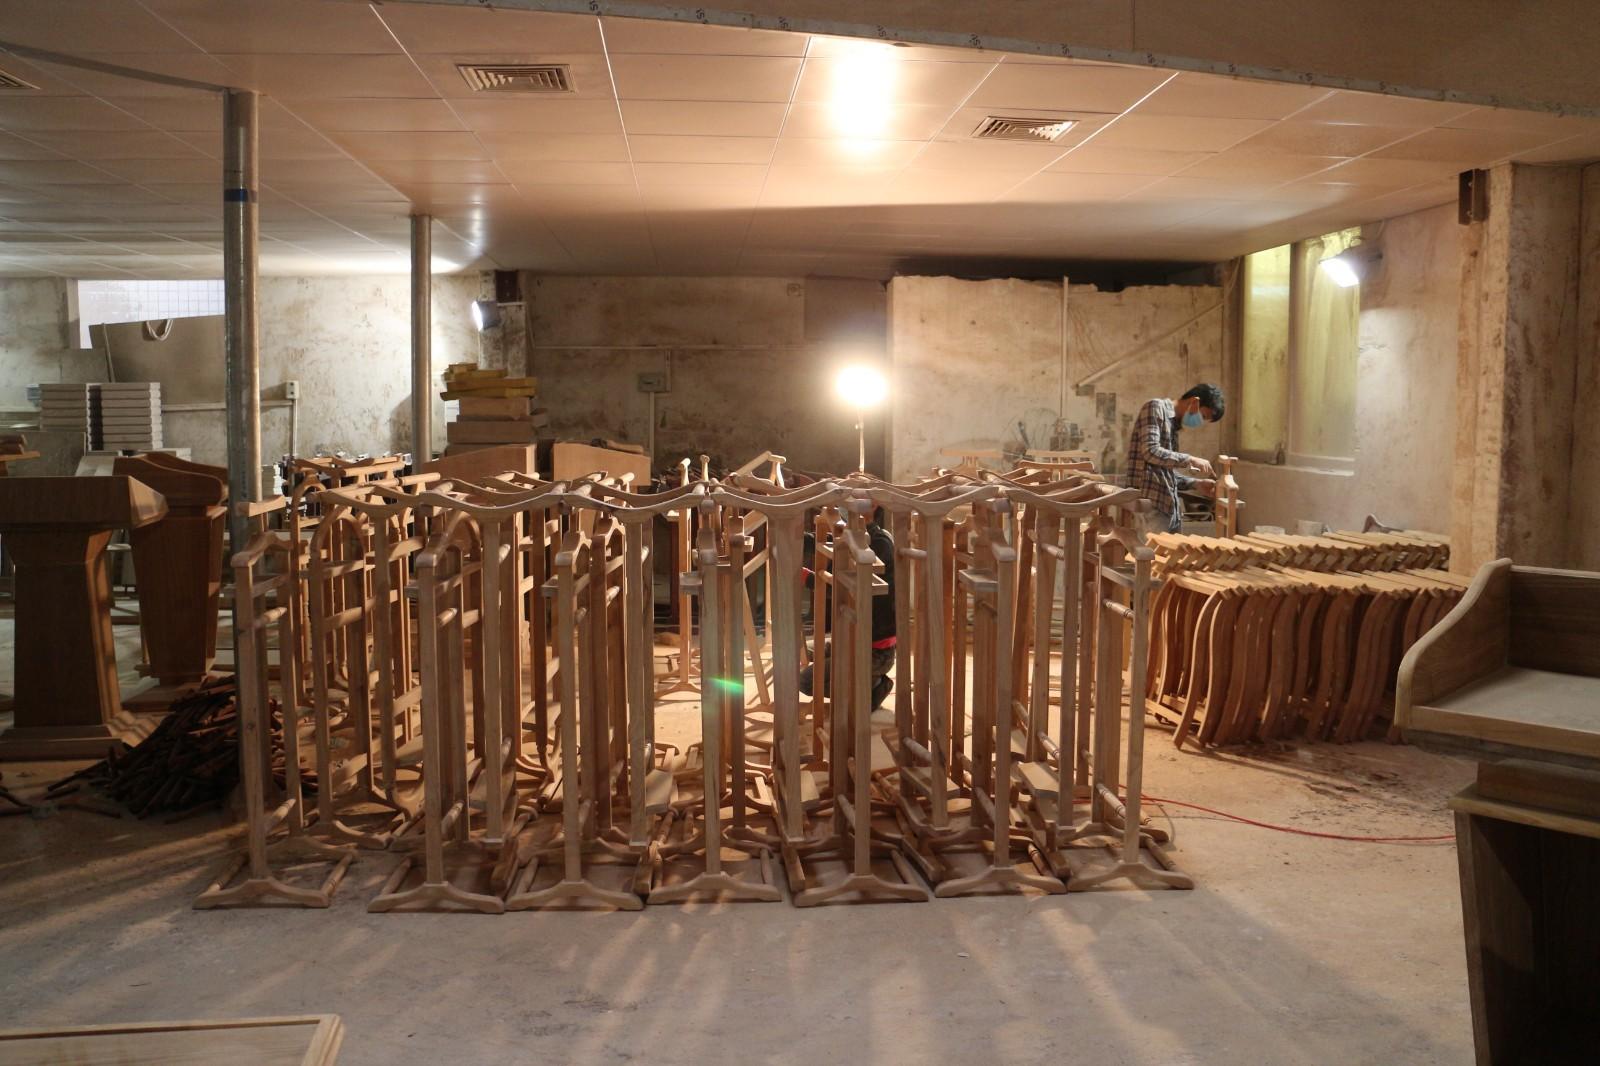 Fenghe-Velvet Rope Barrier Supplier, Queue Line Stand | Fenghe-3